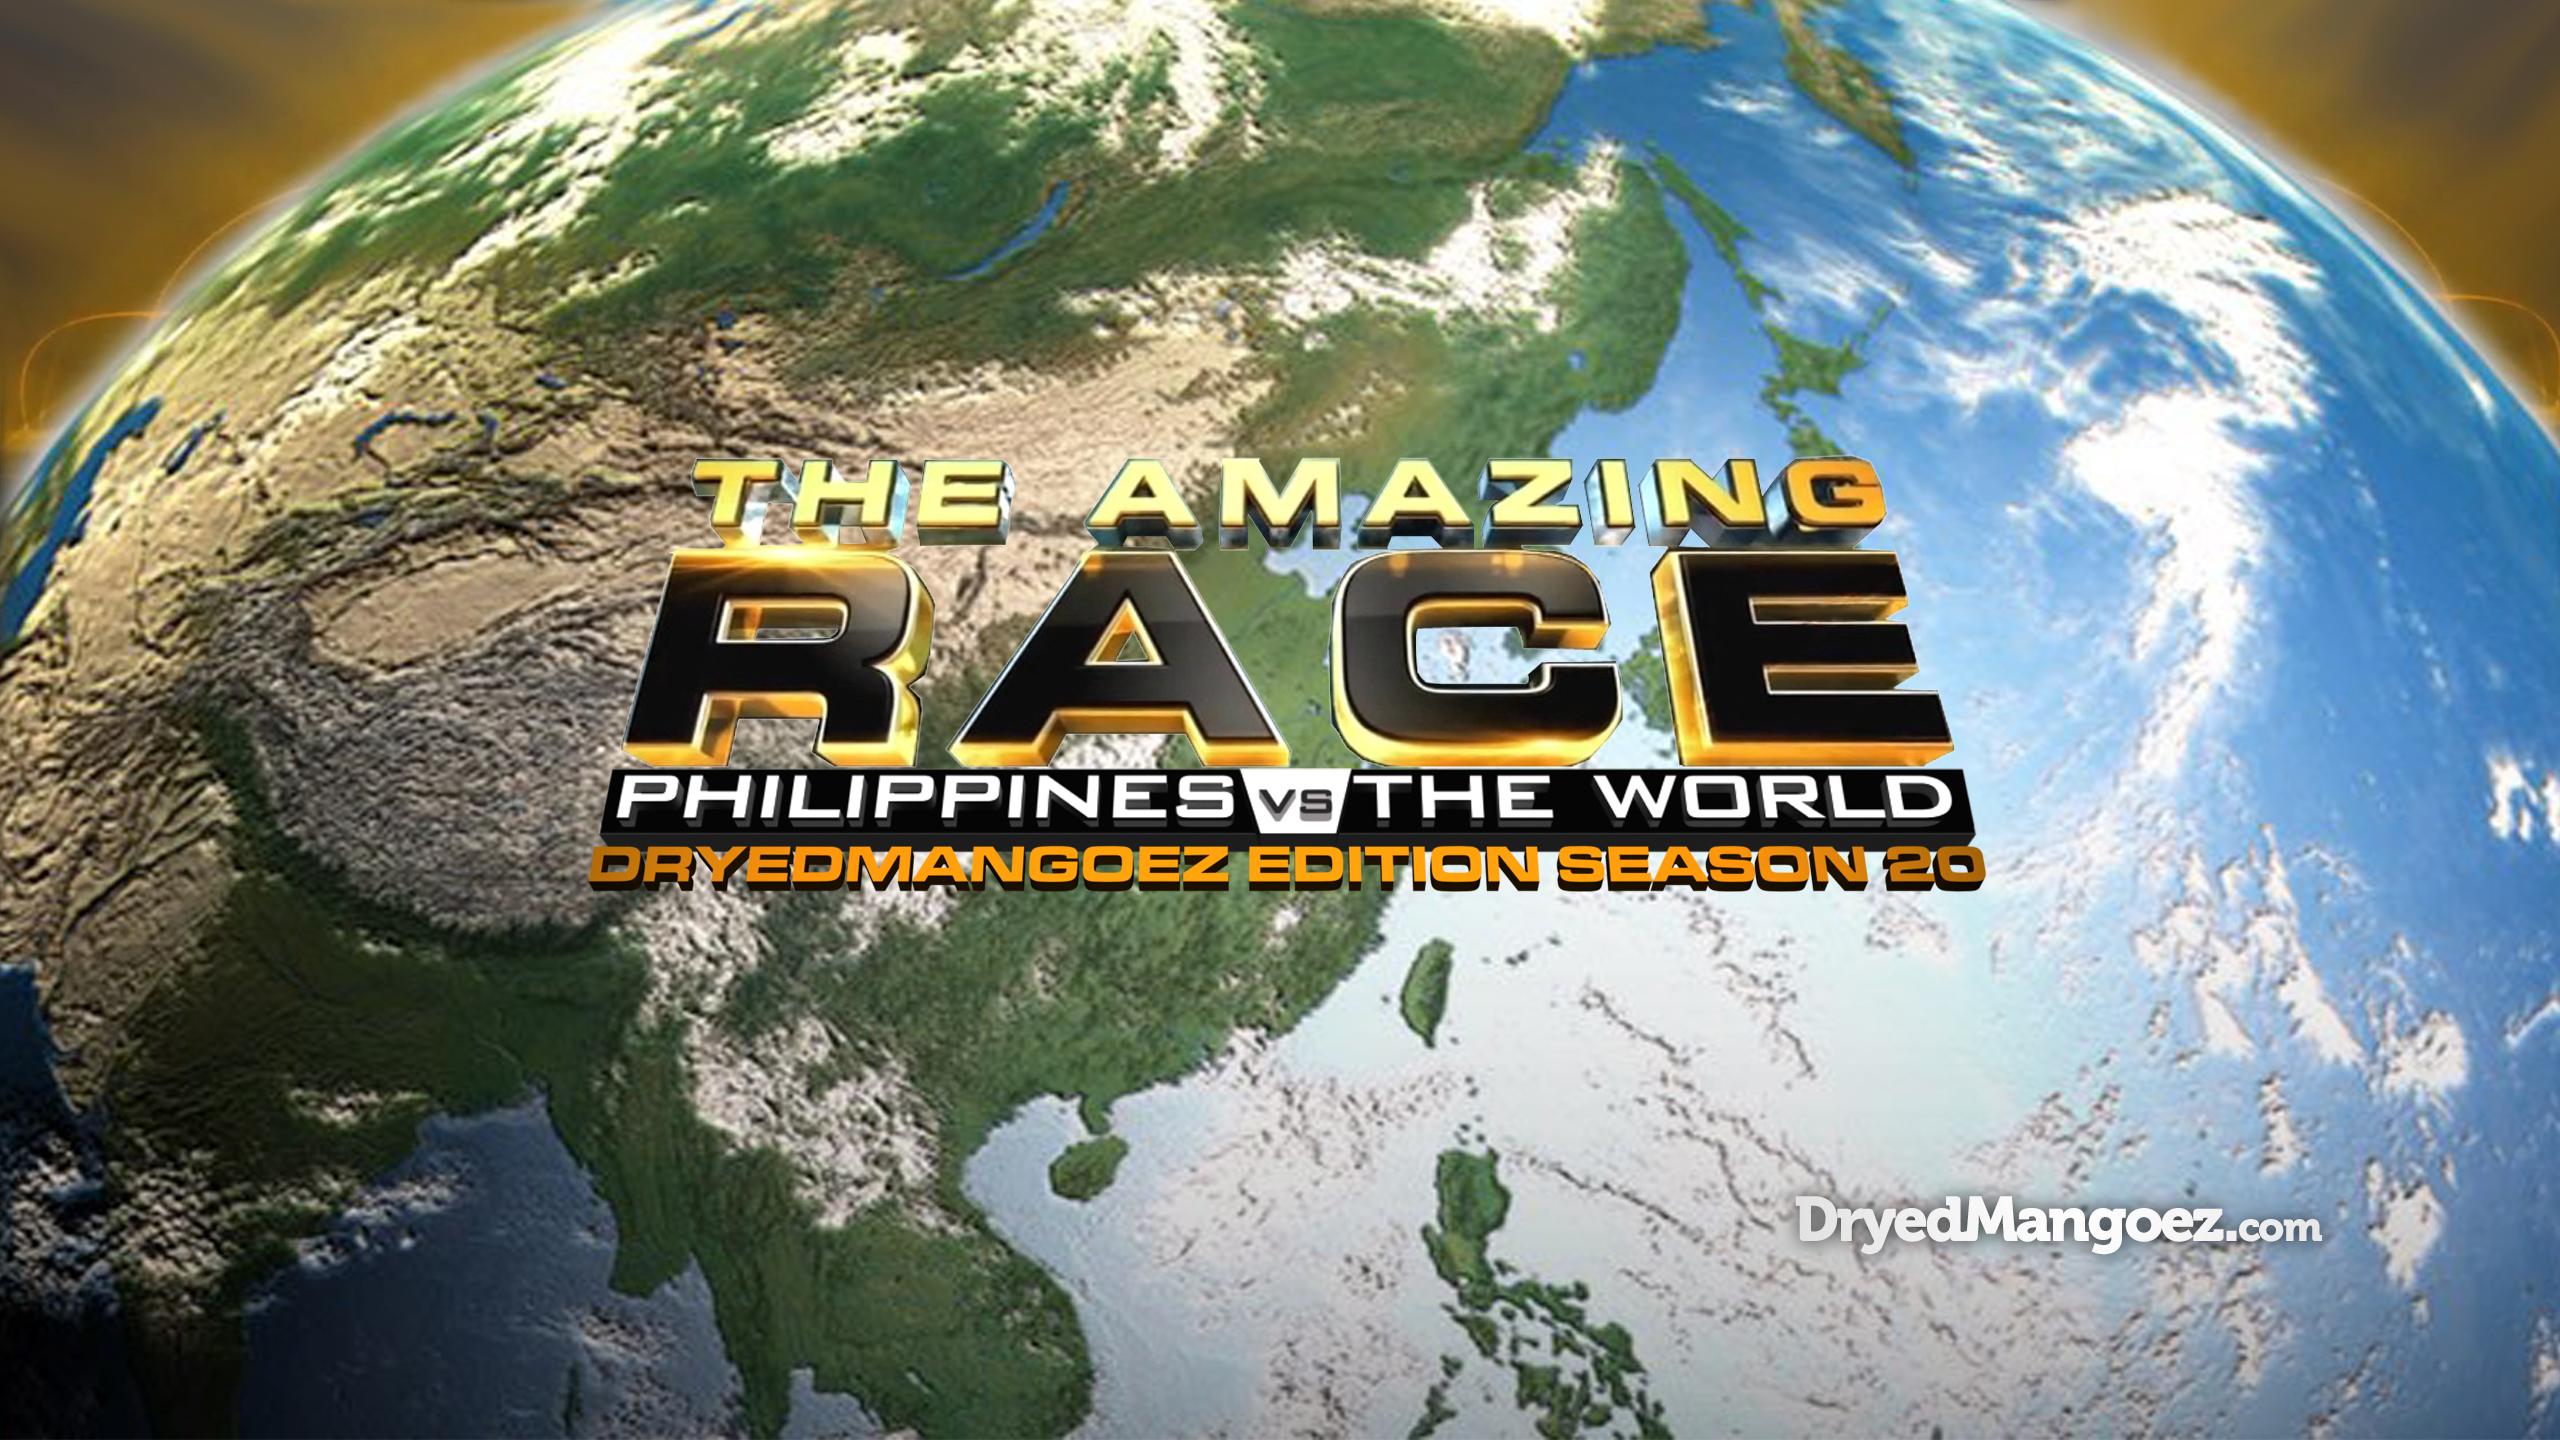 The Amazing Race Philippines vs The World (DryedMangoez Edition Season 20)